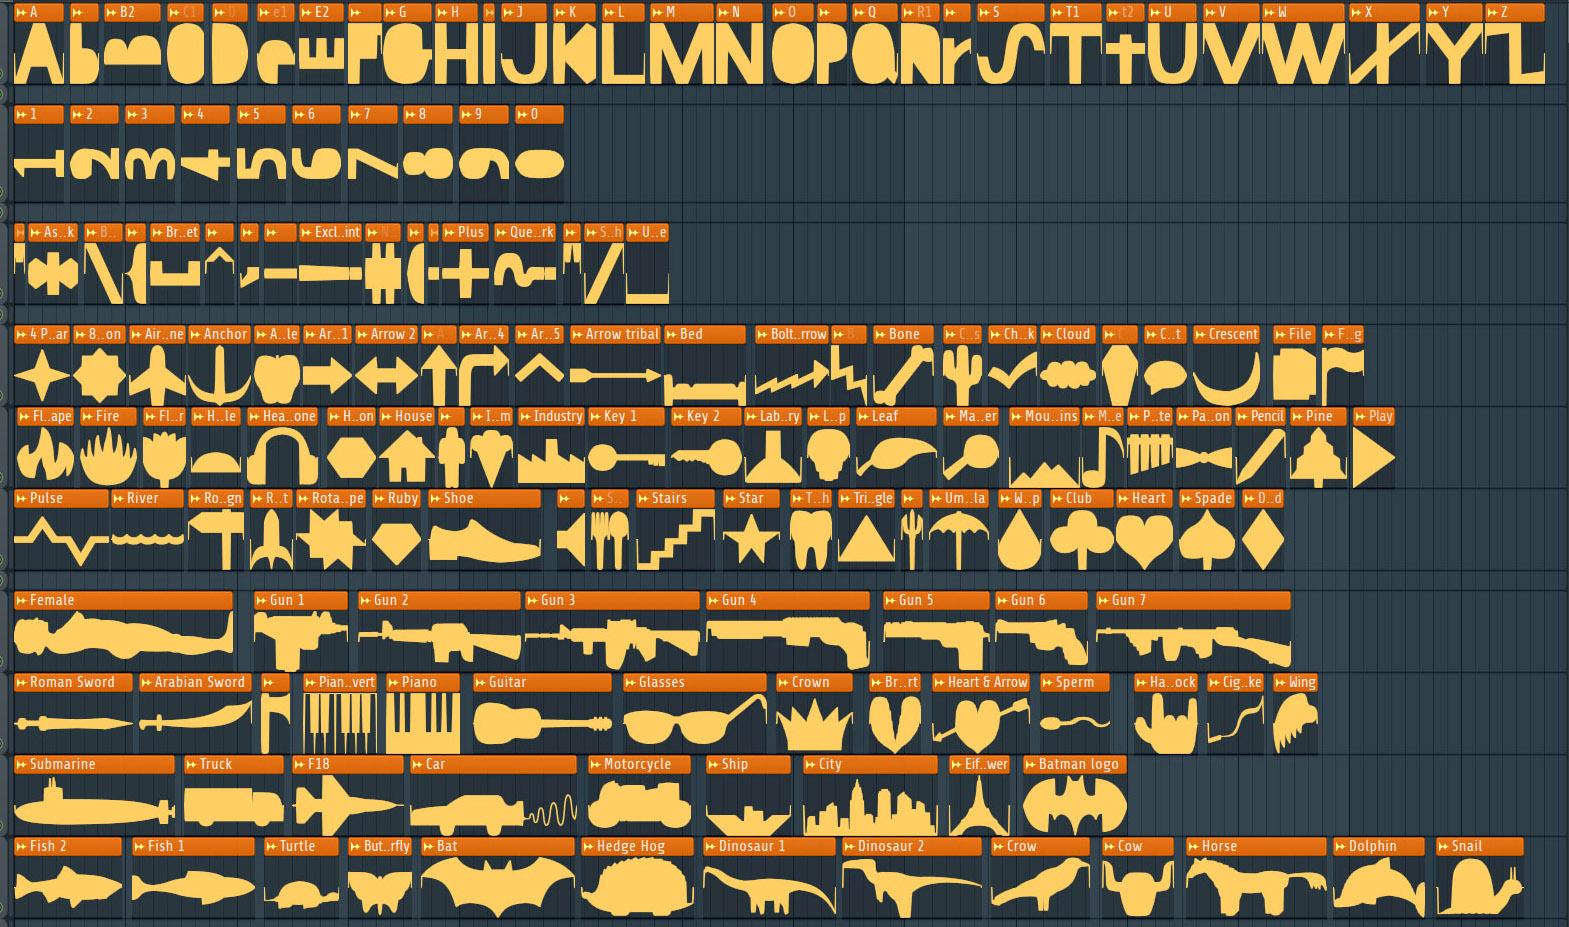 Waveform Genesis by Milinor